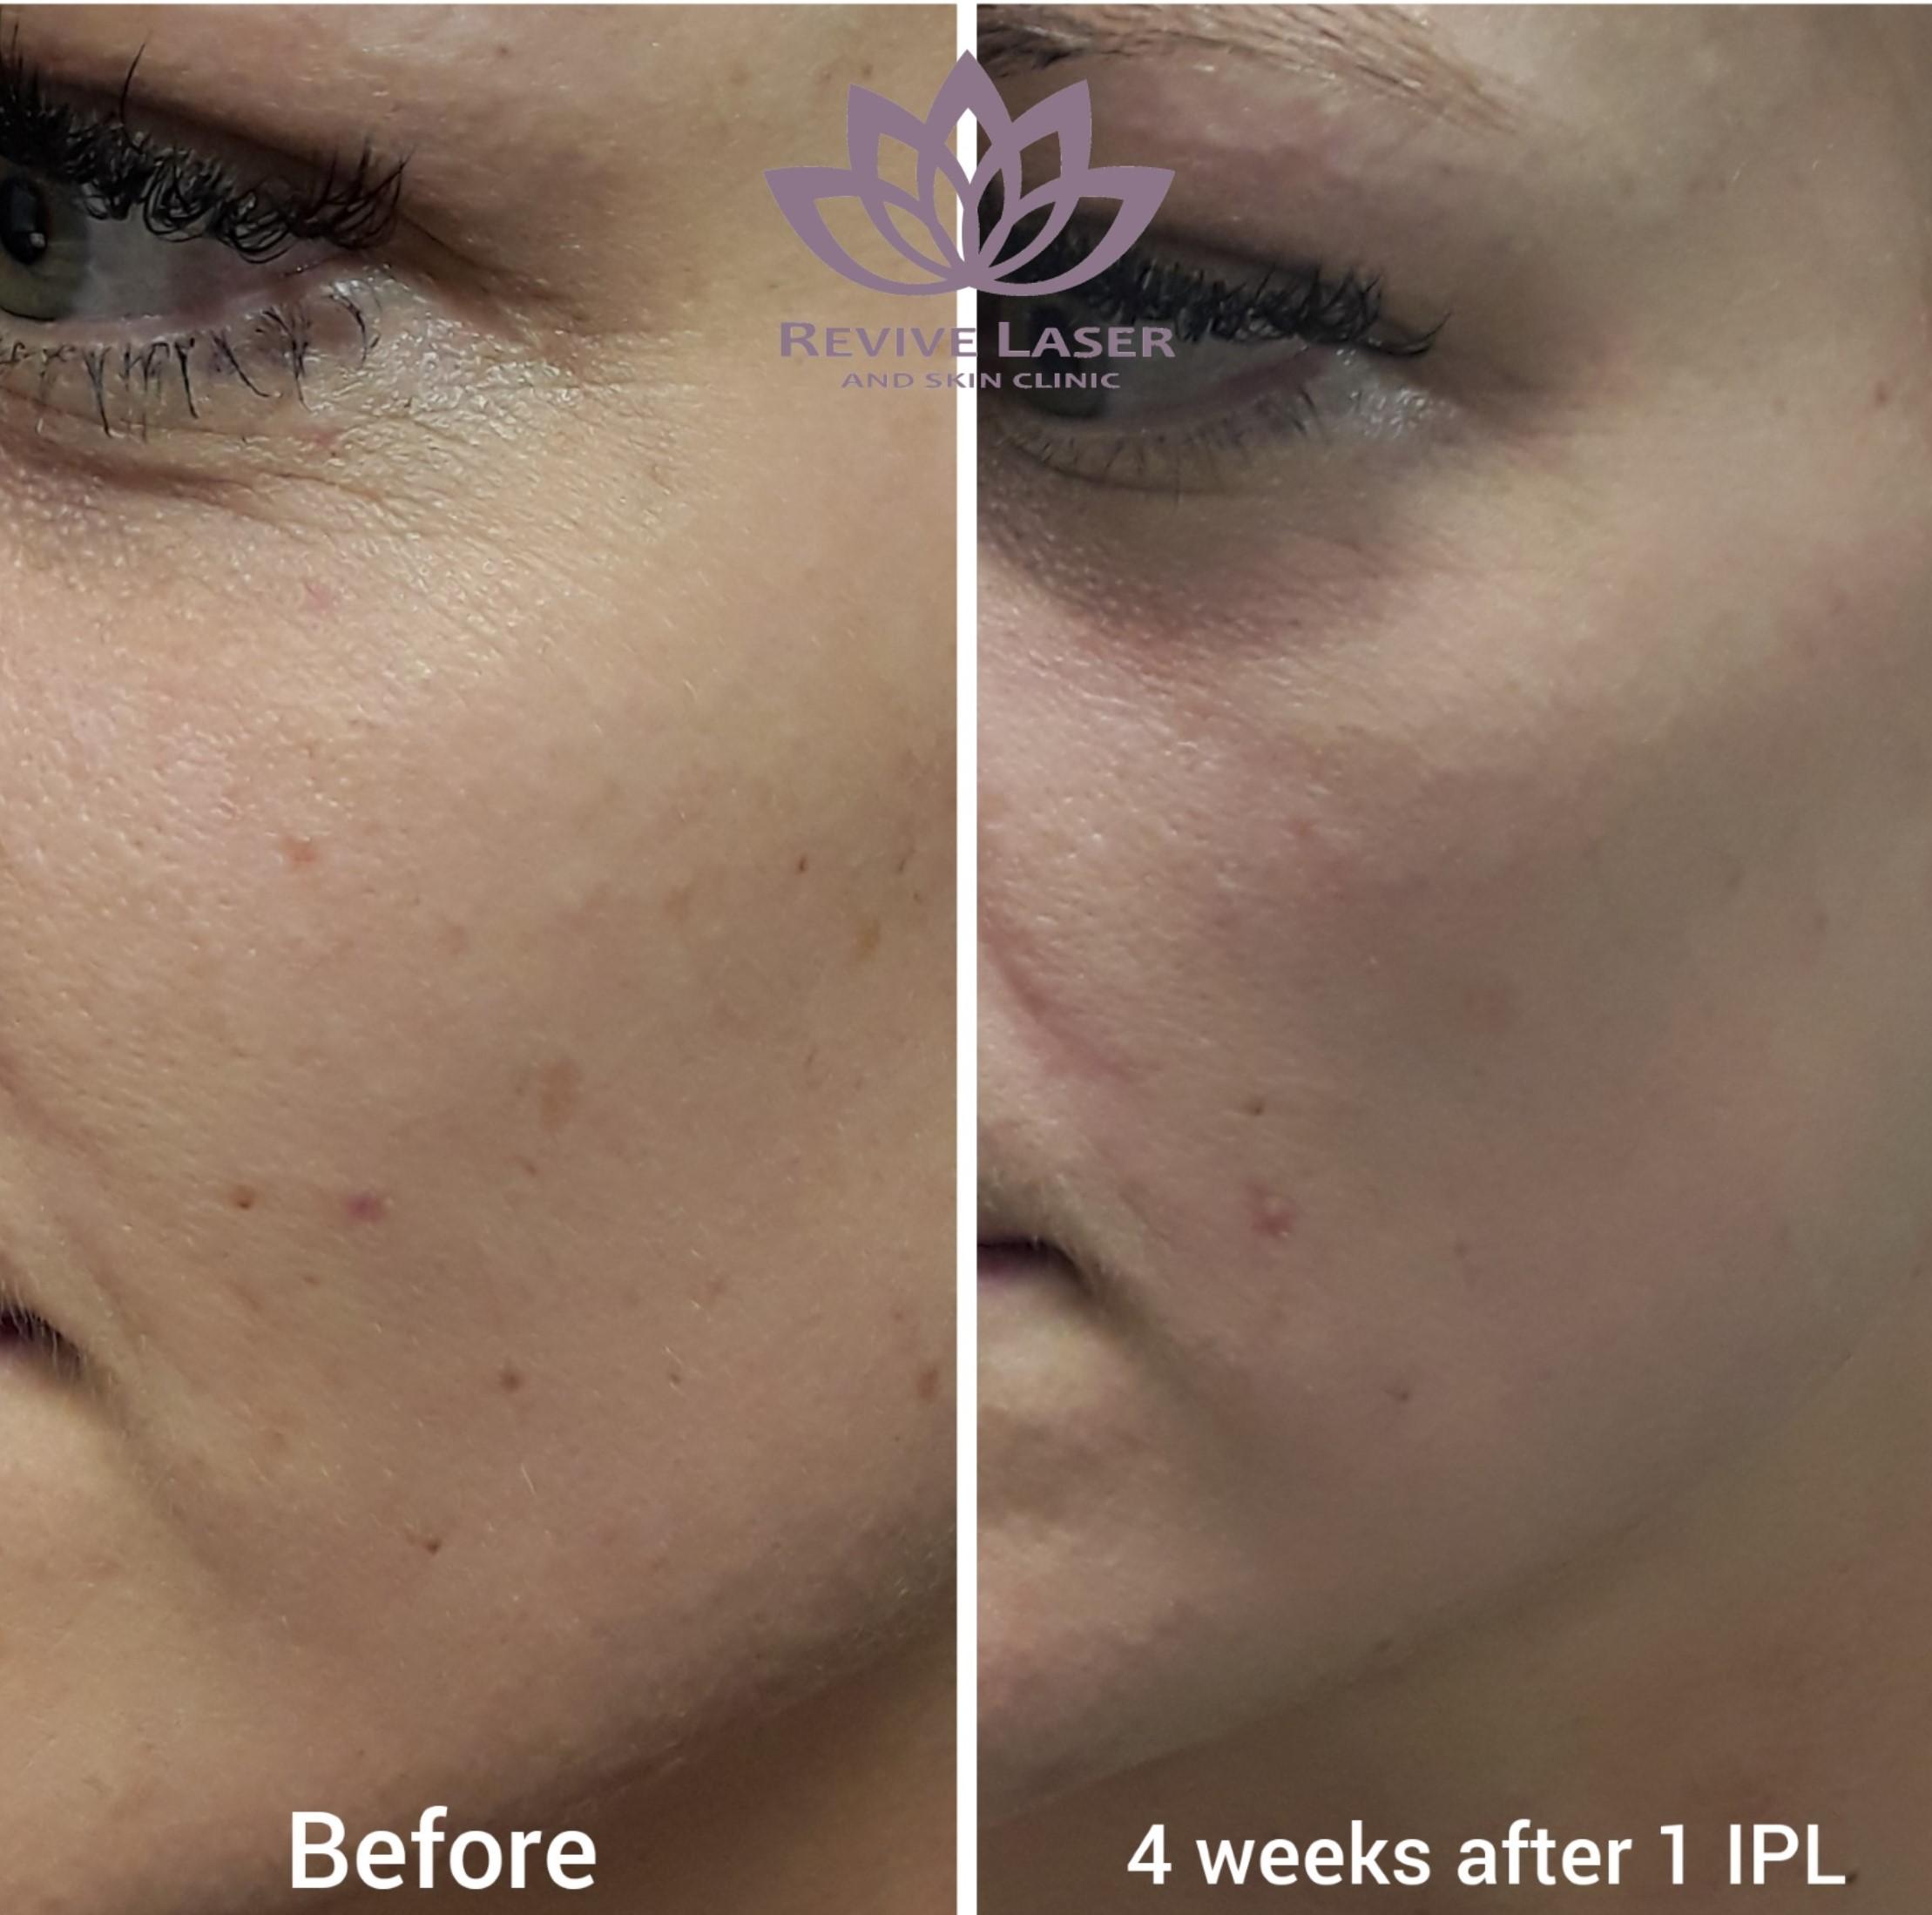 laser eye tightening results | Revive Laser